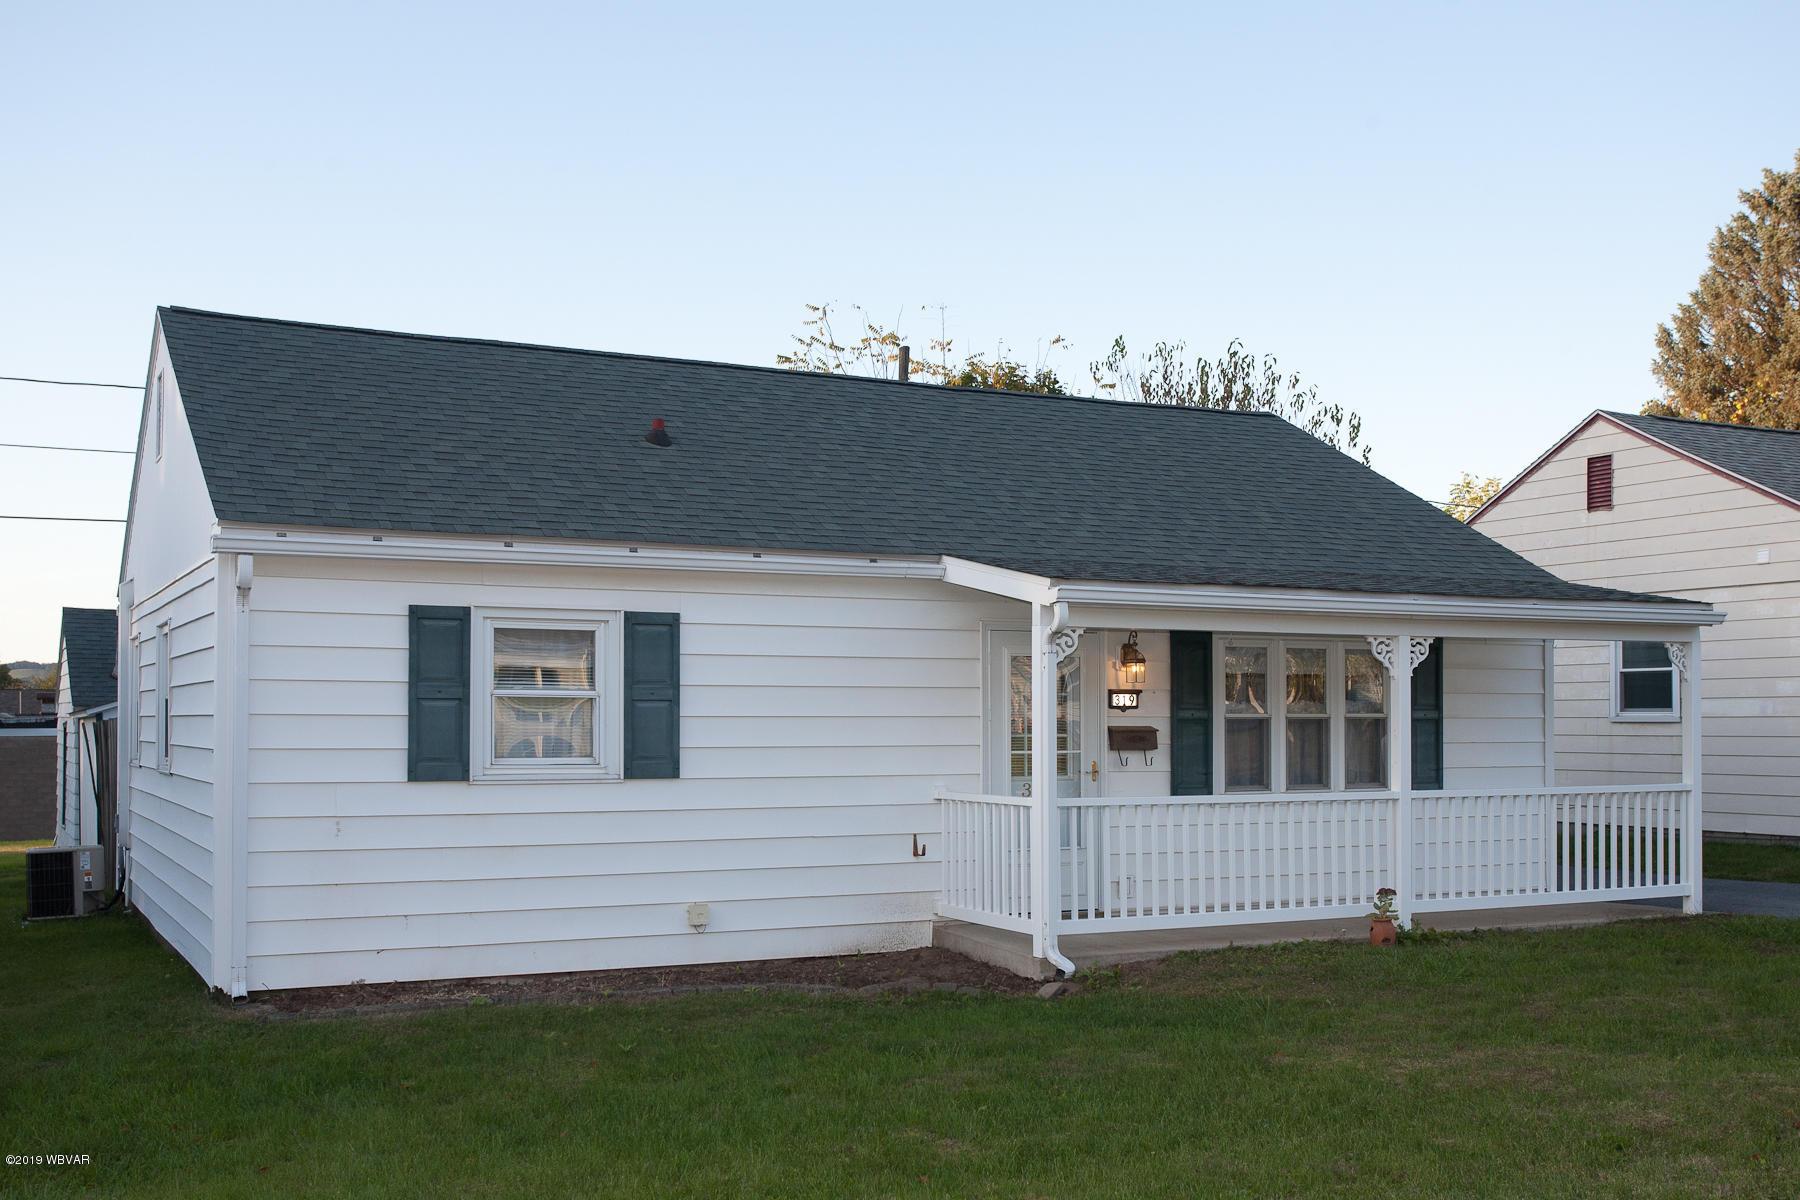 319 ECKMONT AVENUE,S. Williamsport,PA 17702,3 Bedrooms Bedrooms,1 BathroomBathrooms,Residential,ECKMONT,WB-88802